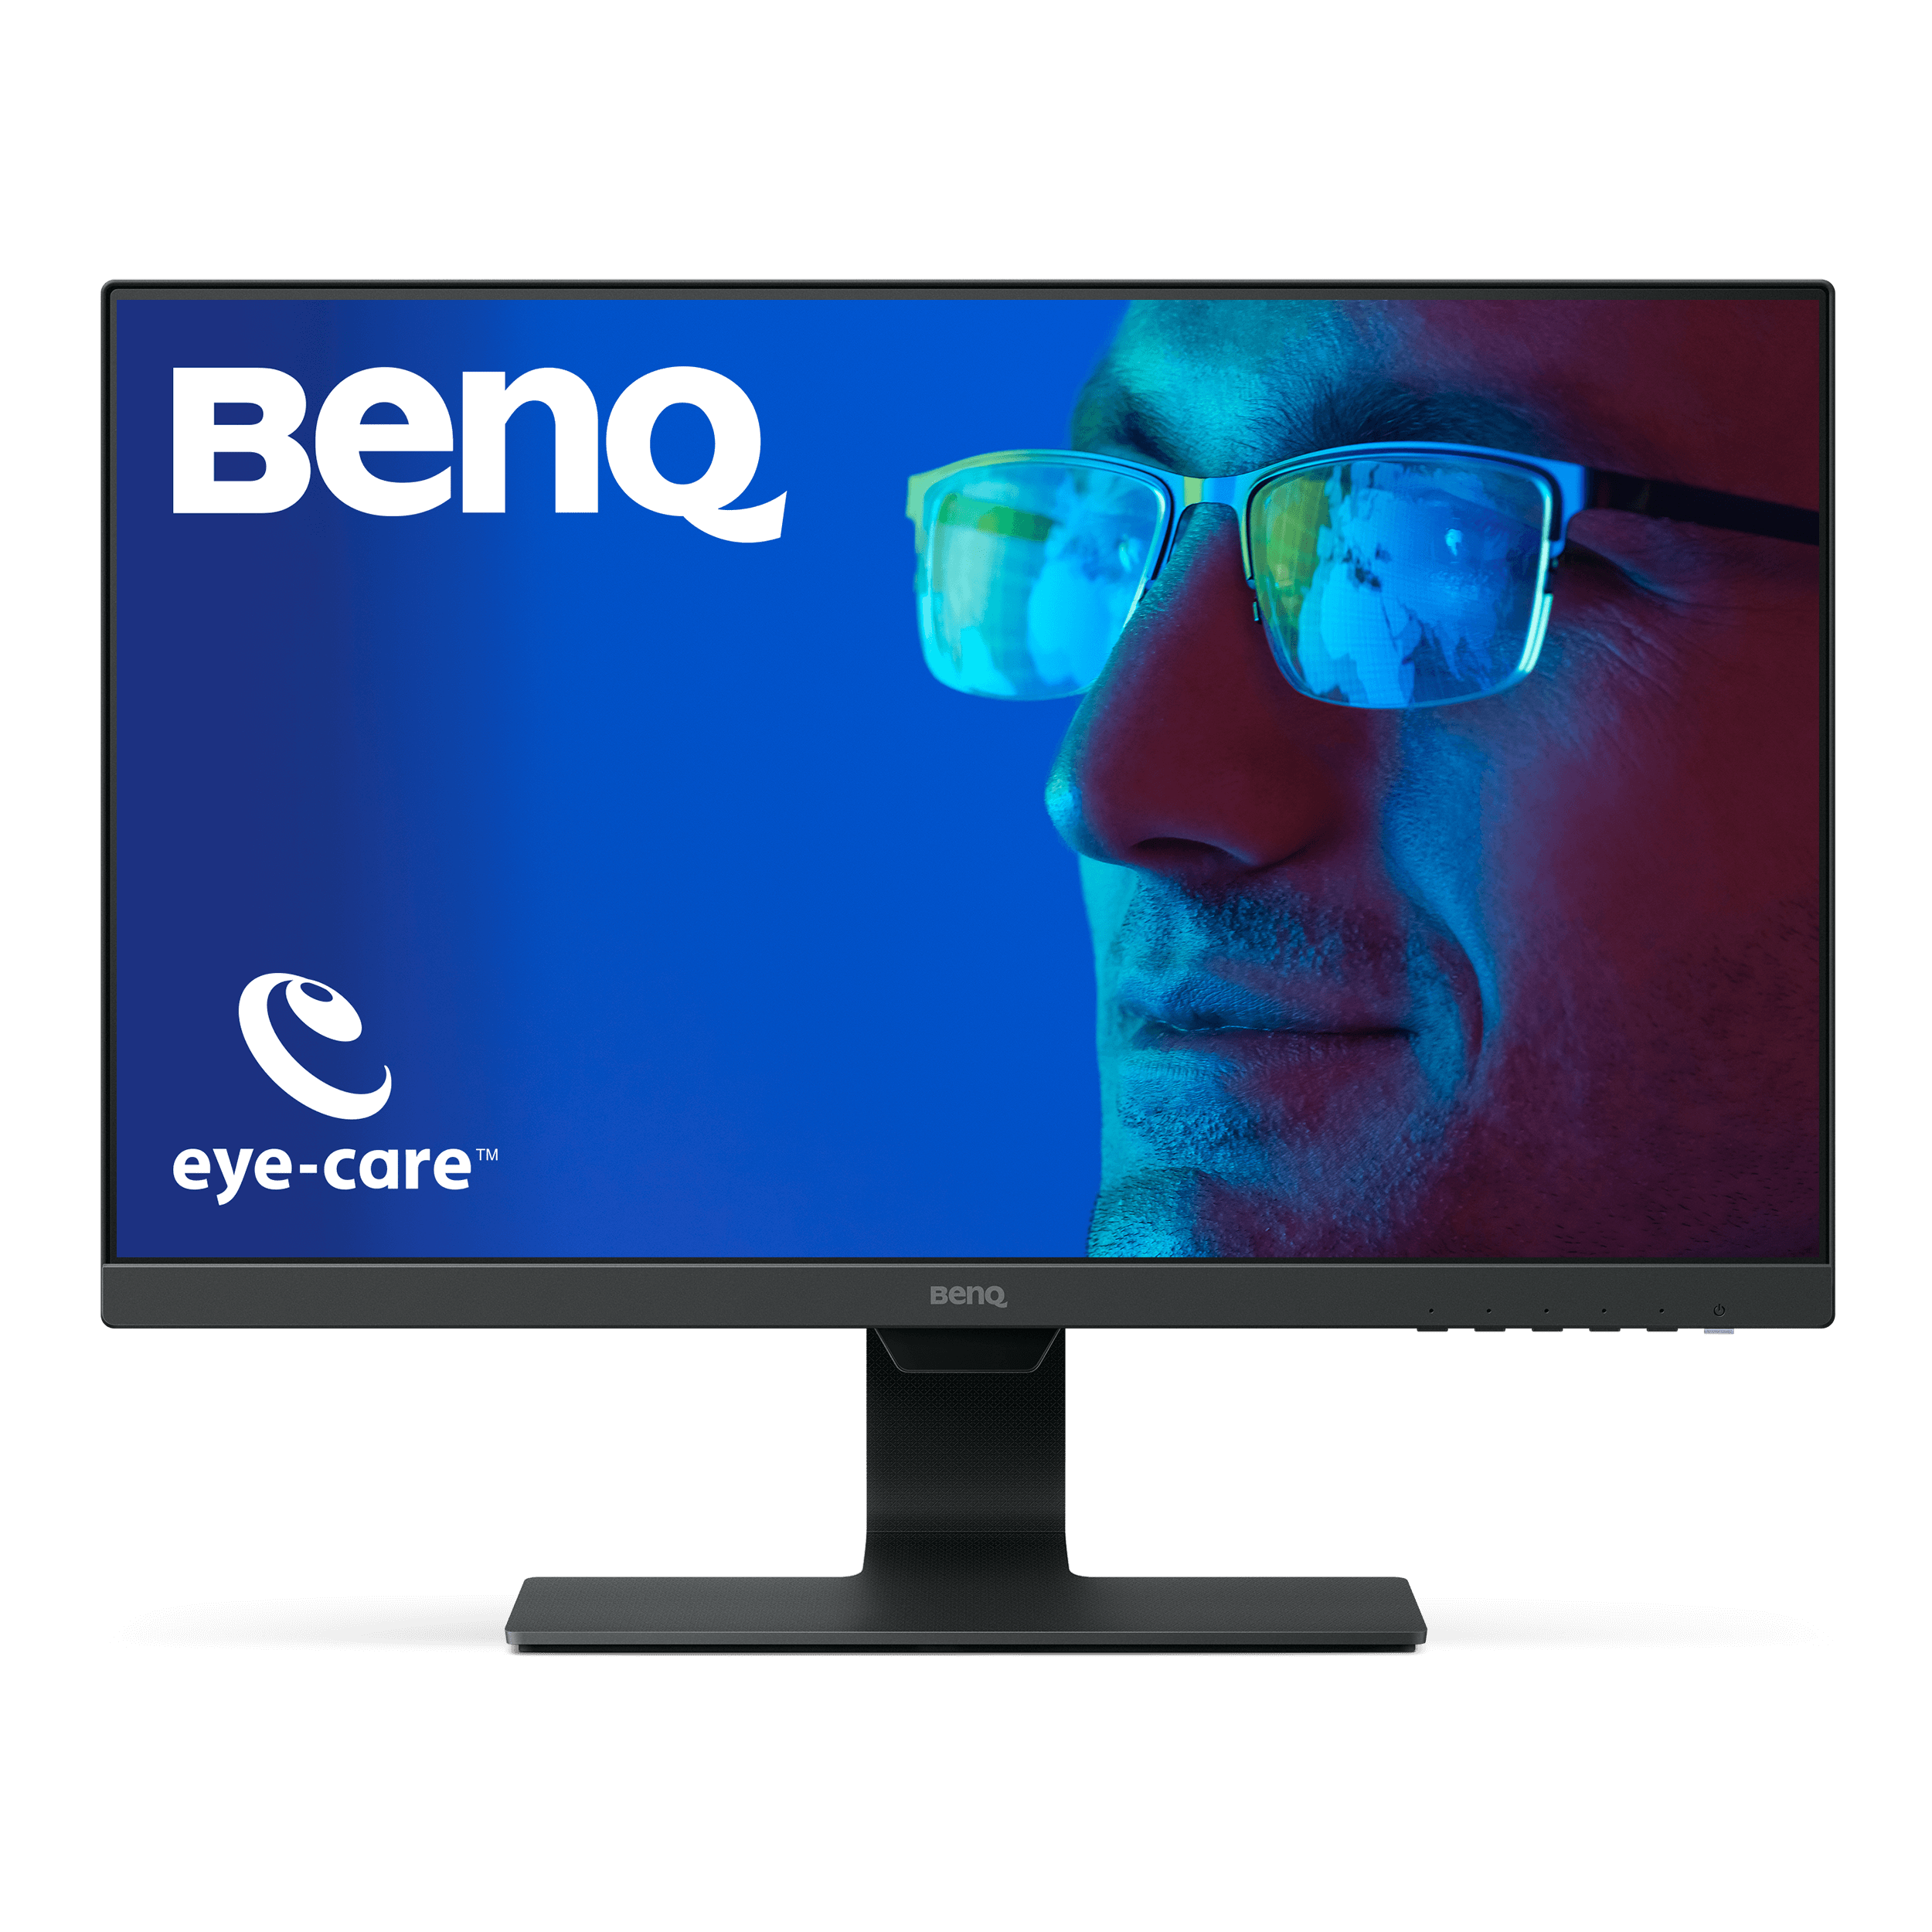 GW2480 Stylish Monitor with Eye-care Technology | BenQ